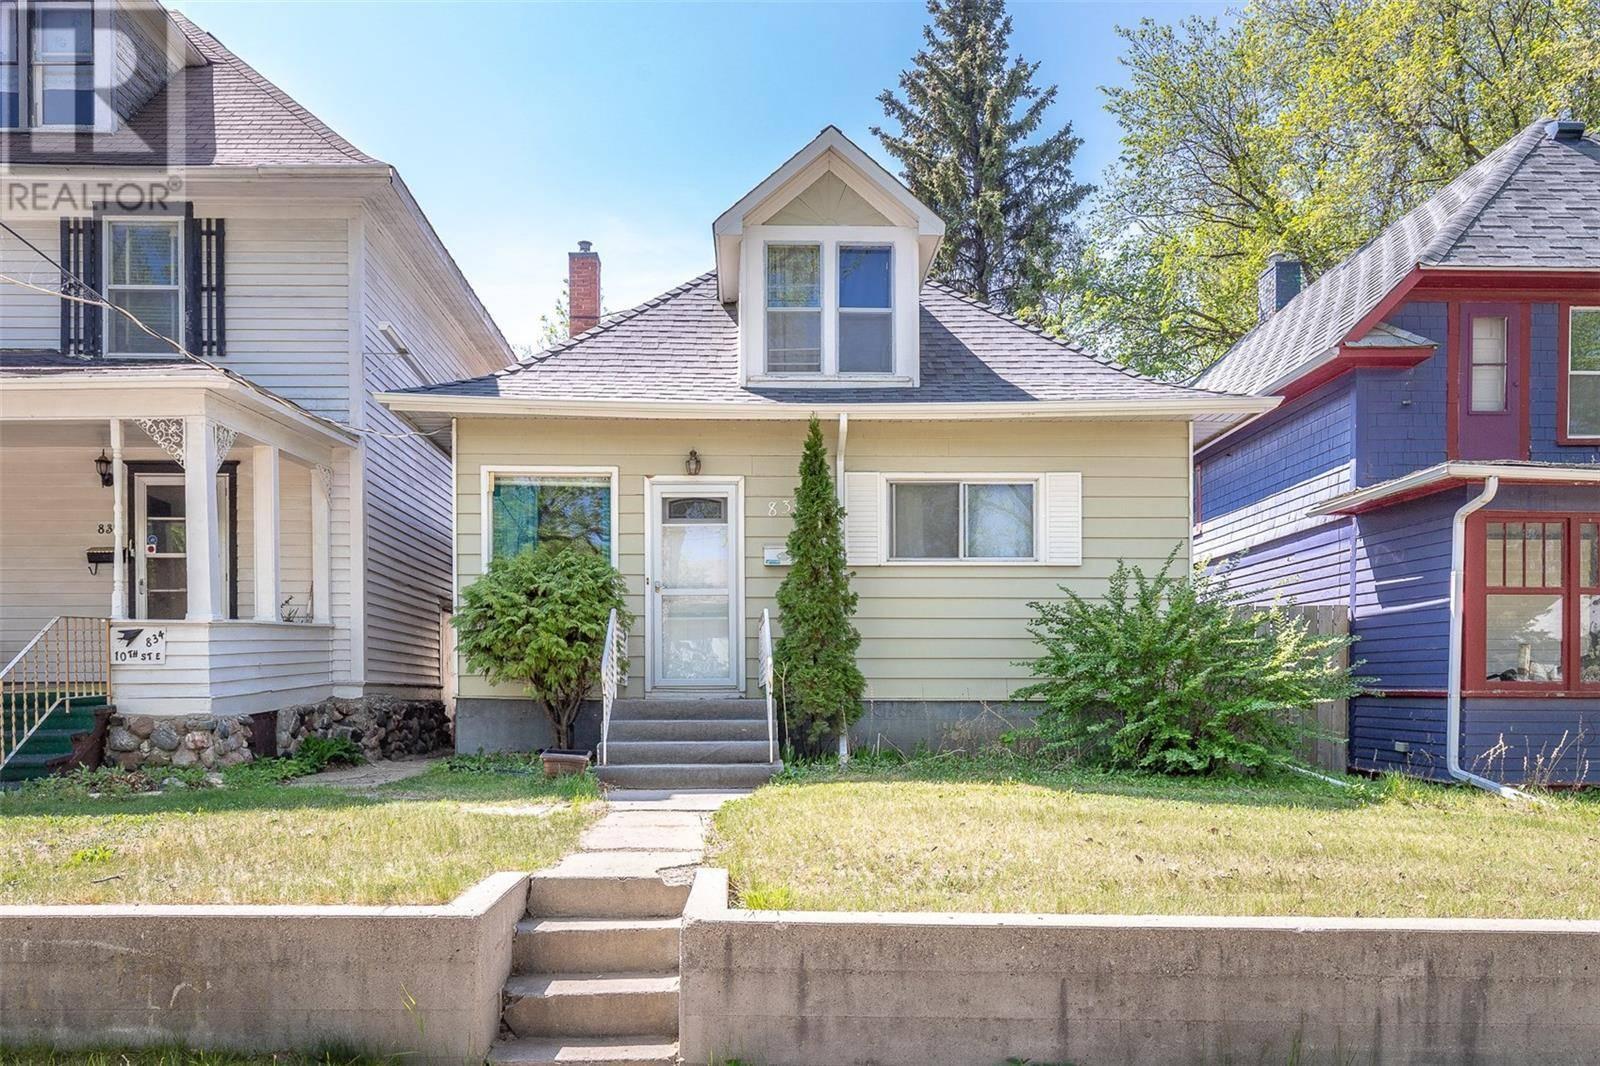 House for sale at 830 10th St E Saskatoon Saskatchewan - MLS: SK783732